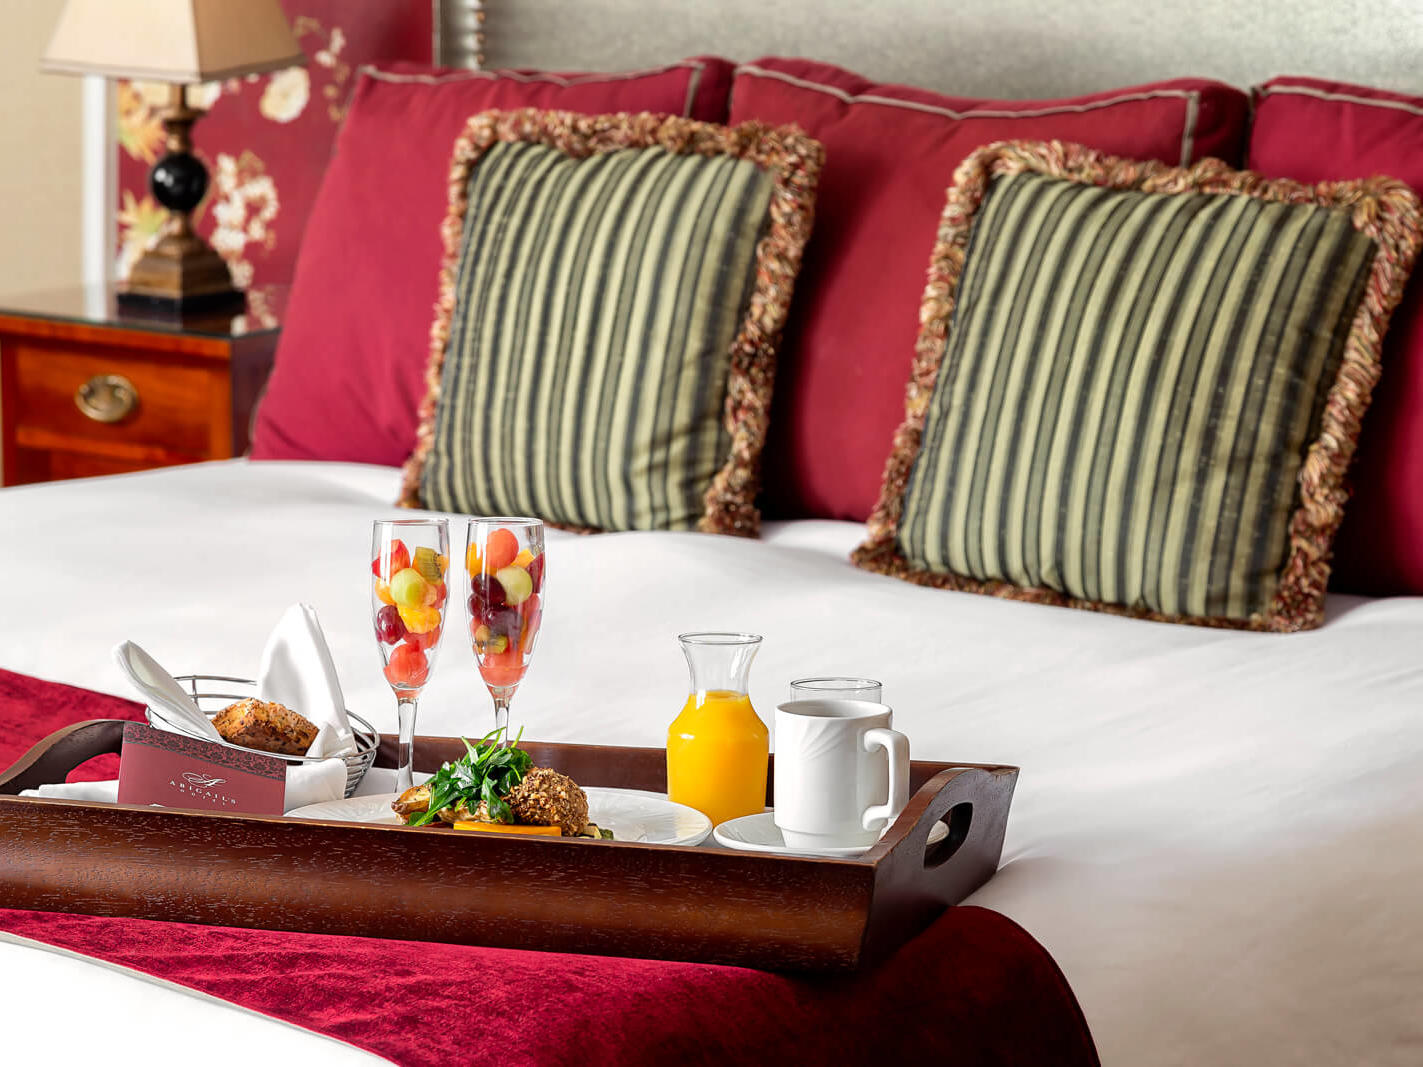 Breakfast tray on bed.